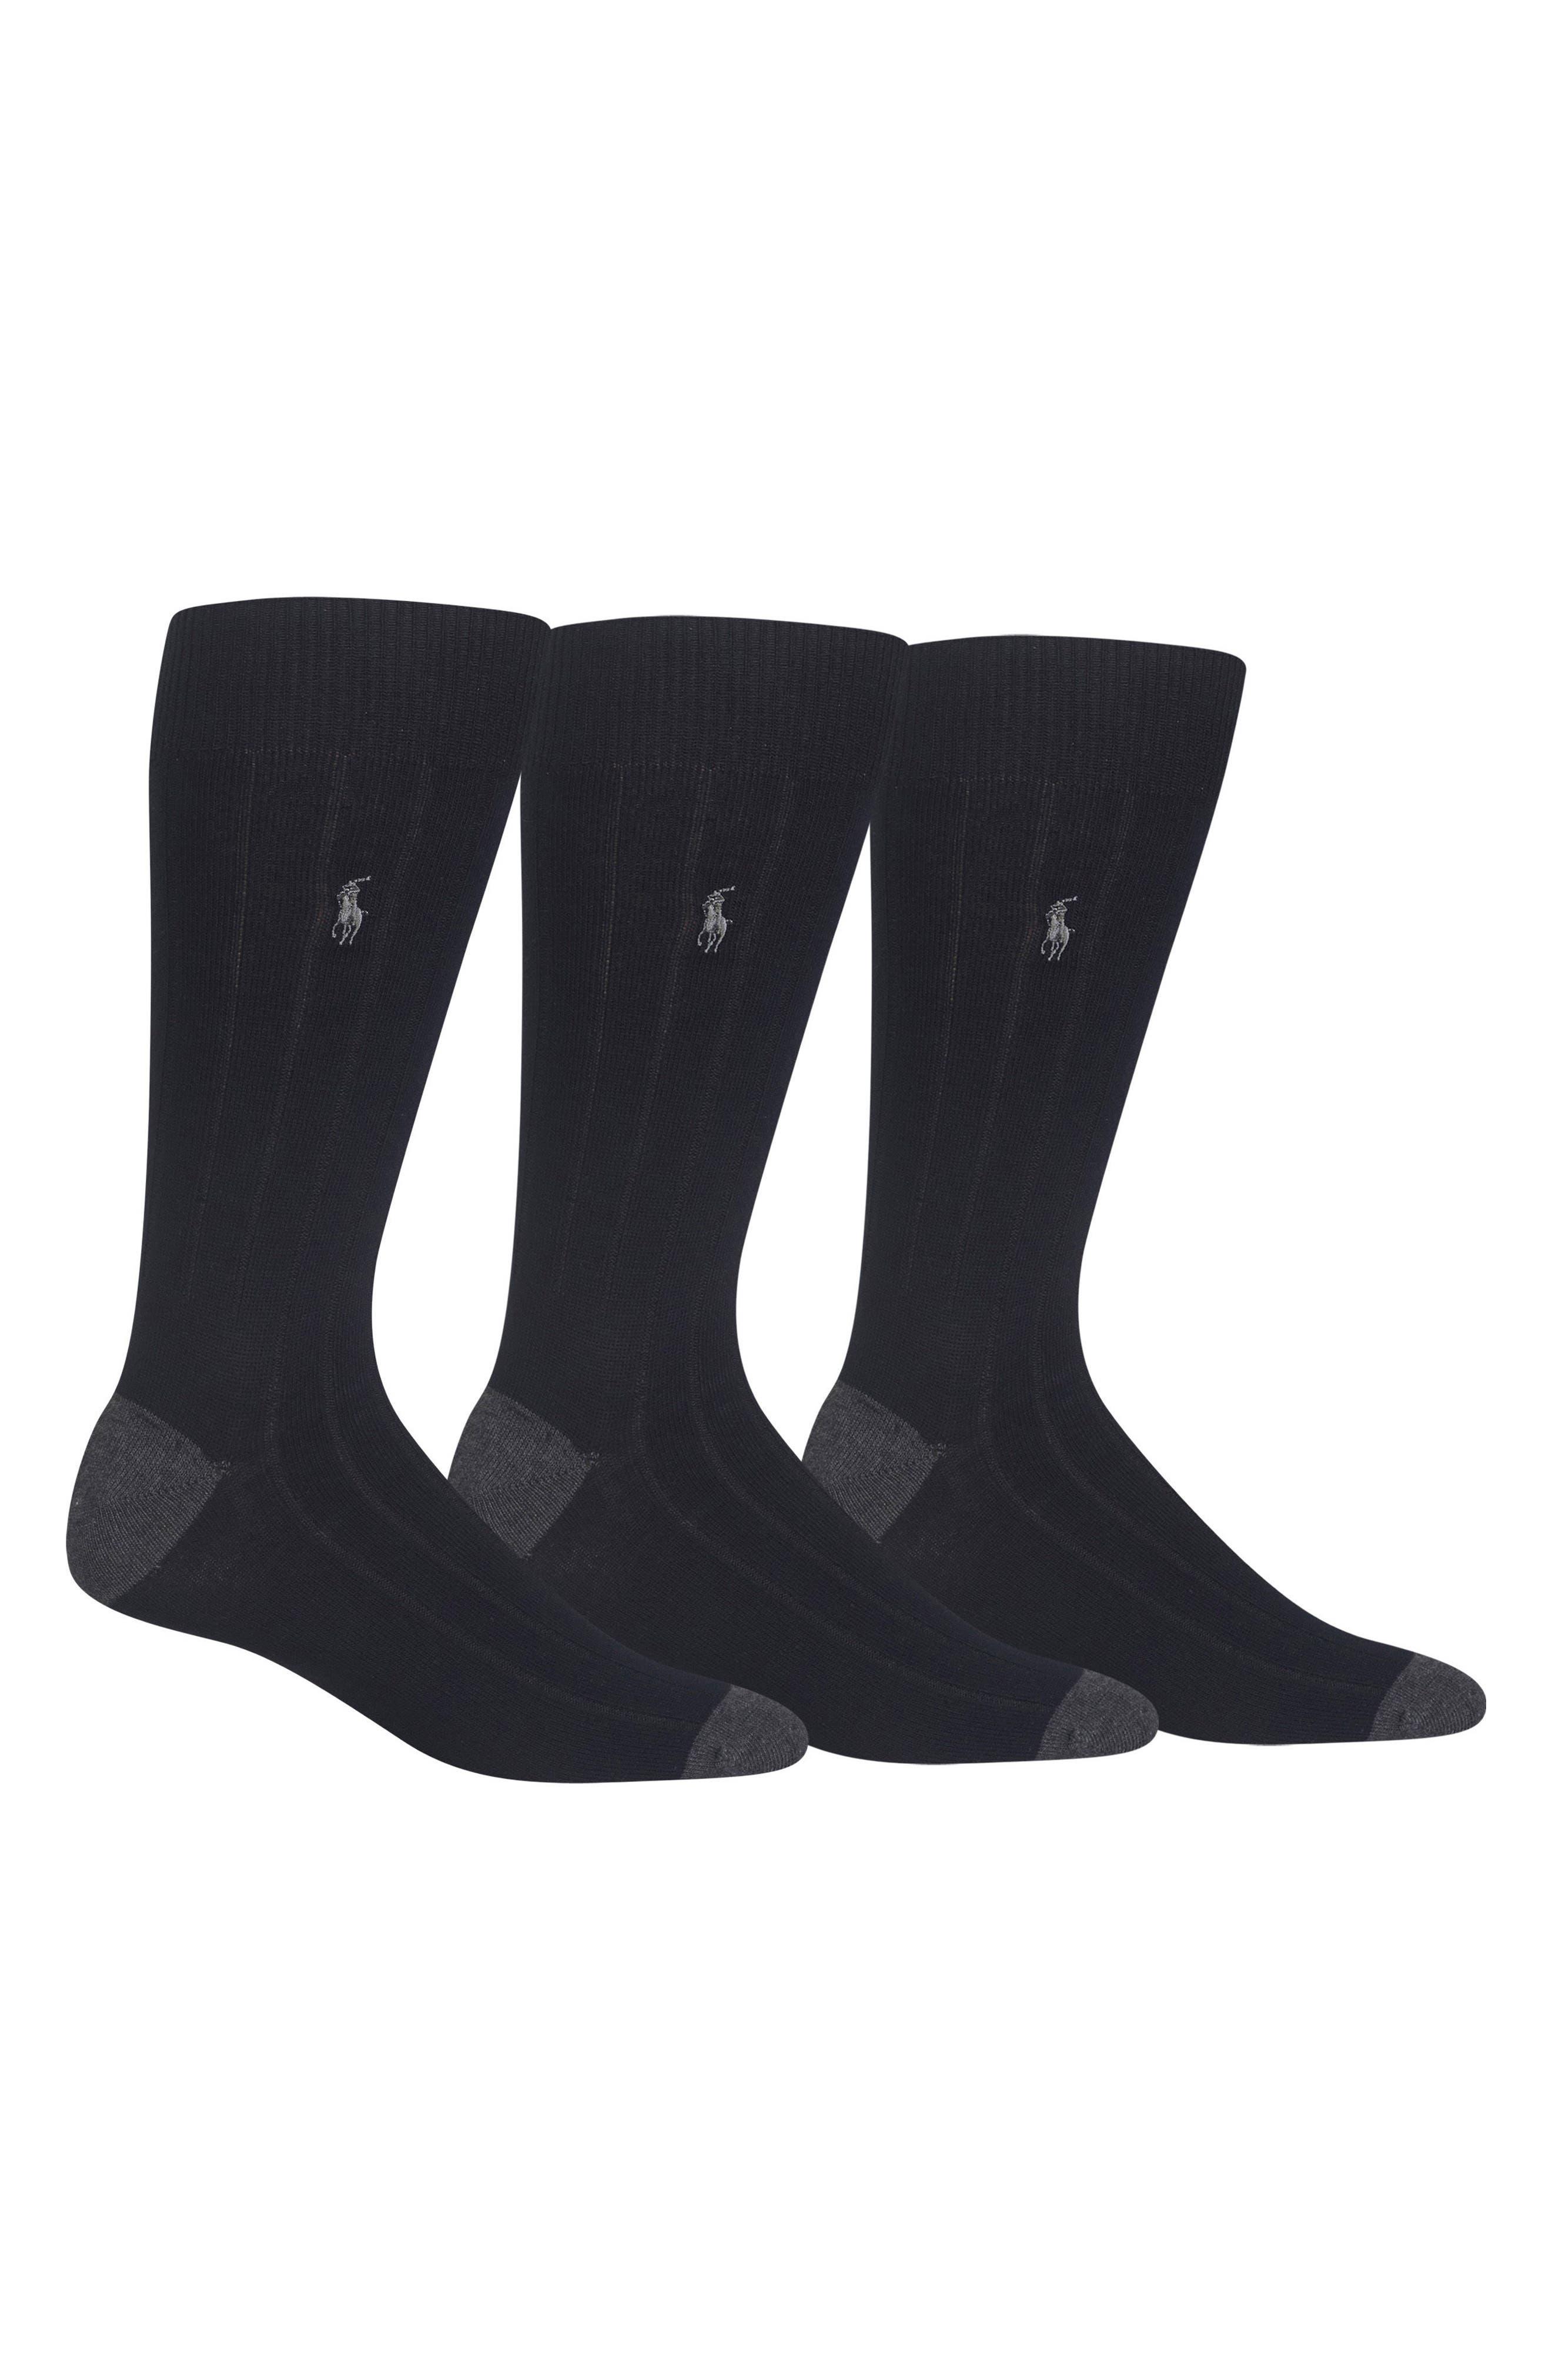 POLO RALPH LAUREN, 3-Pack Ribbed Socks, Main thumbnail 1, color, BLACK